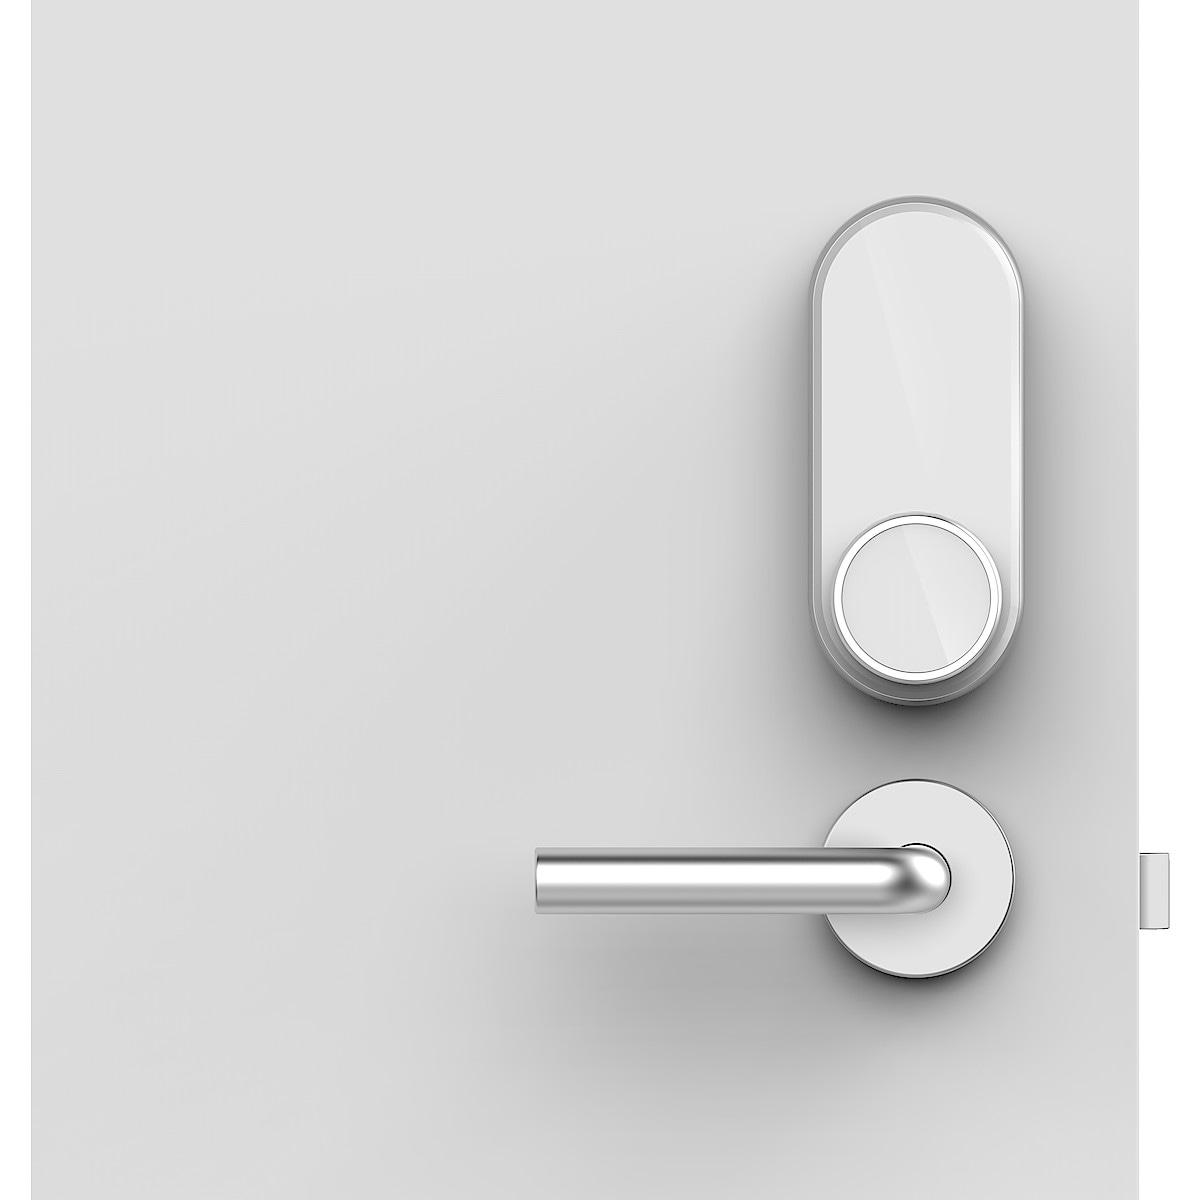 Elektroninen ulko-oven lukko Glue Smart Lock